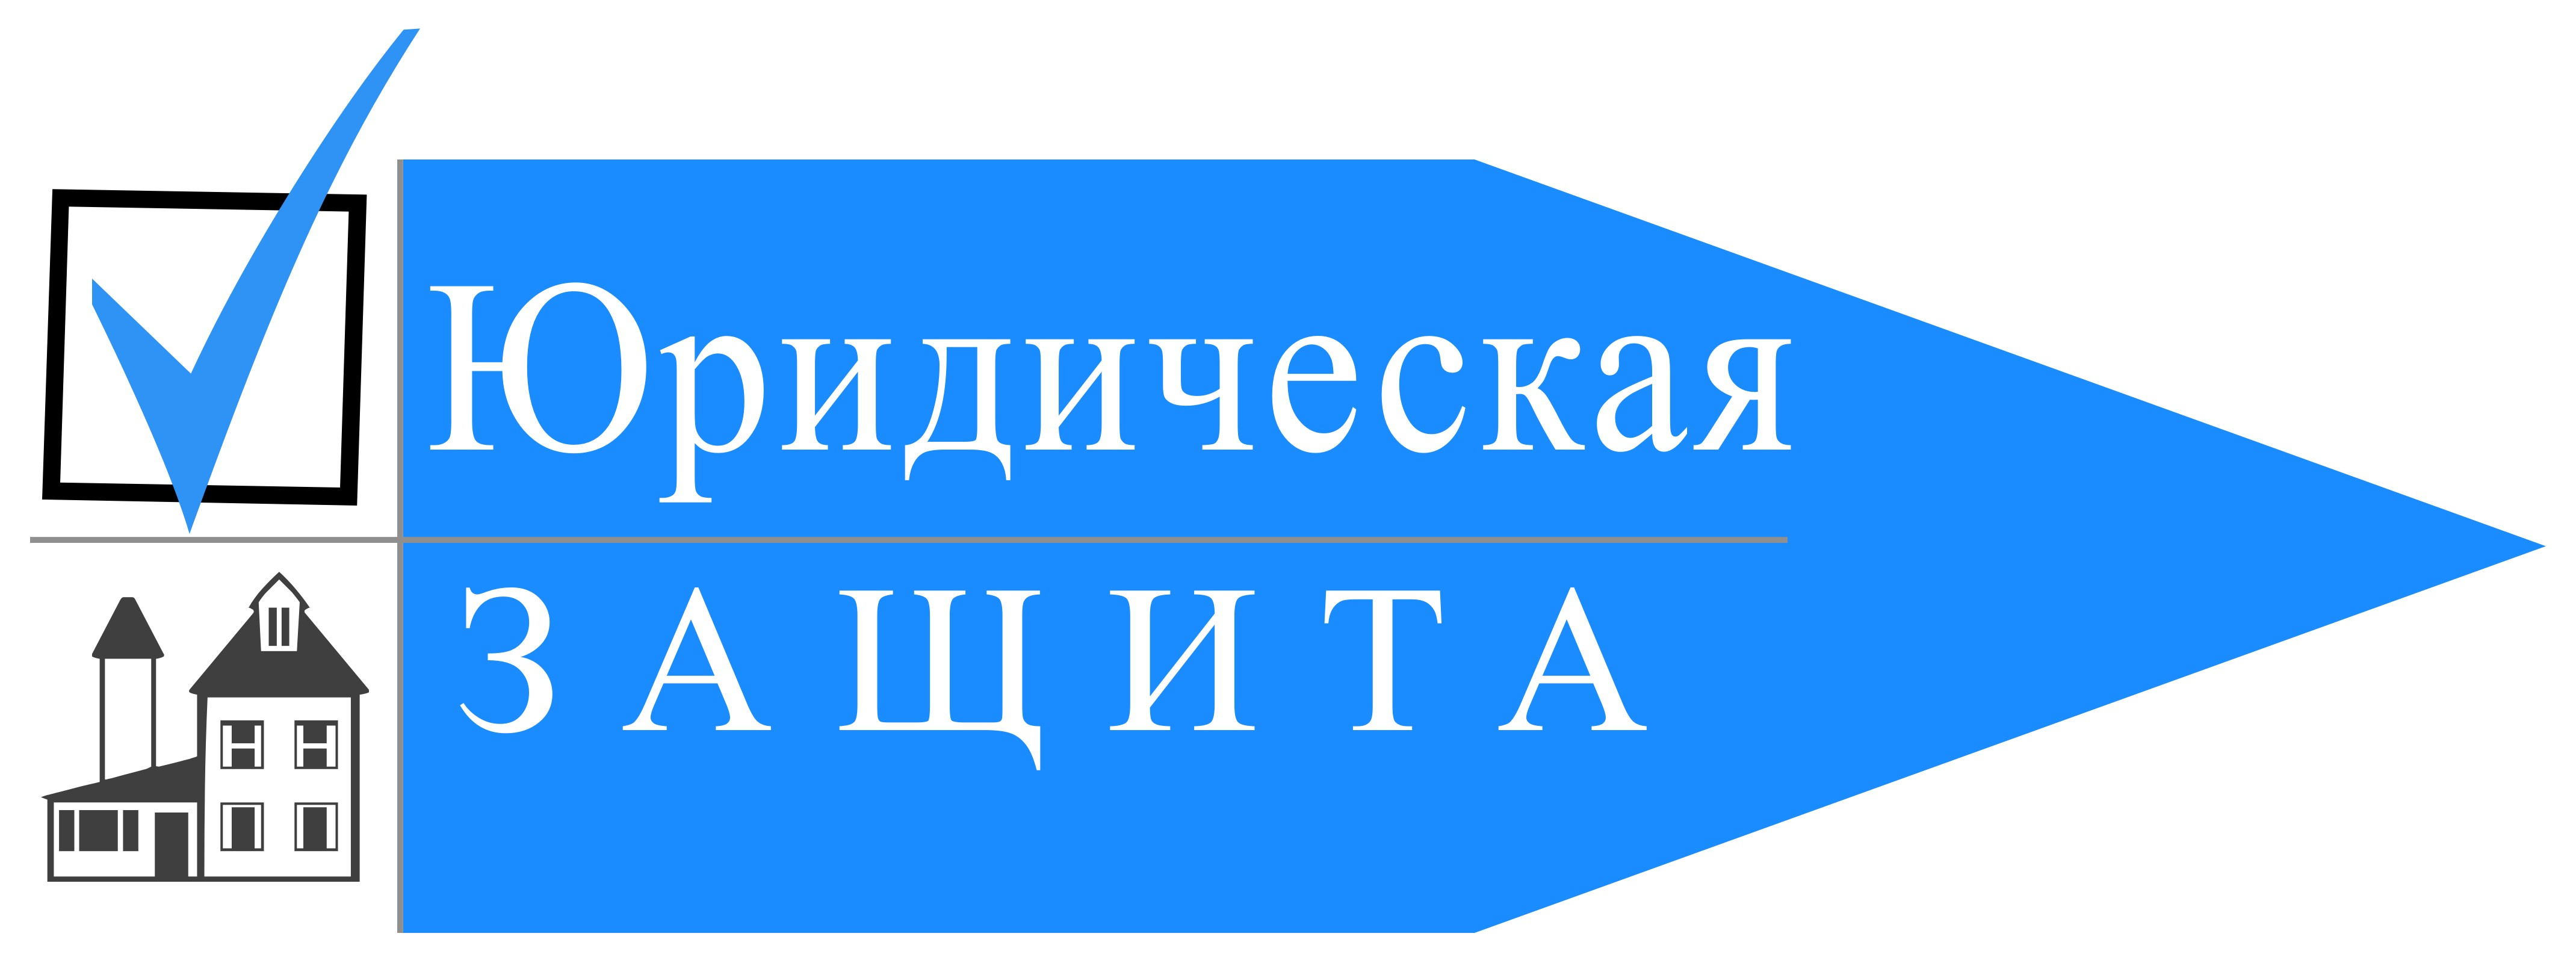 Разработка логотипа для юридической компании фото f_51655df0214a089a.jpg